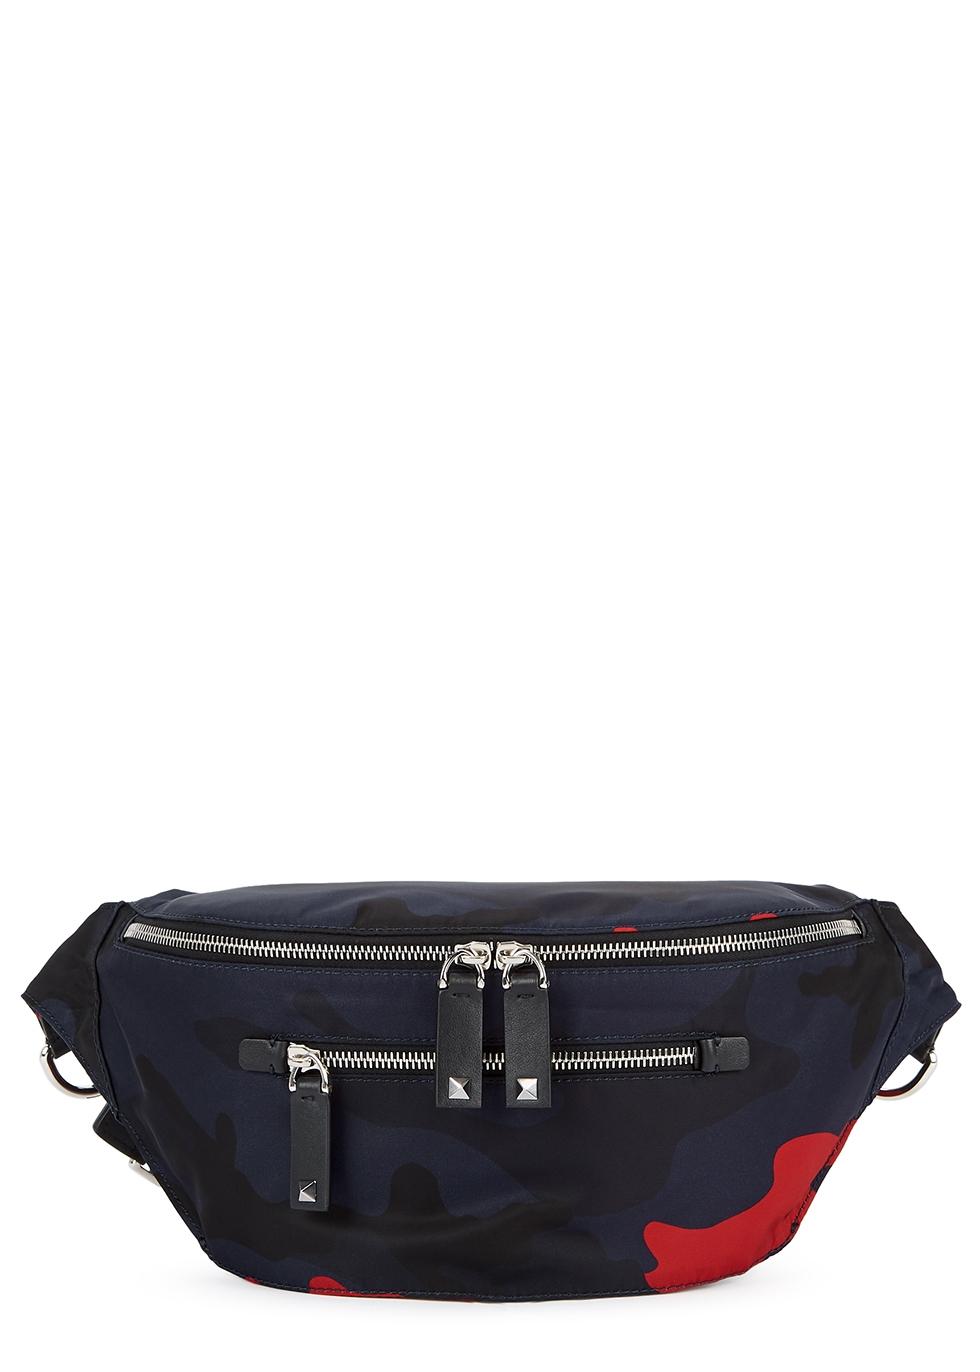 28f9be8c69eb Men's Designer Clothing, Shoes and Bags - Harvey Nichols